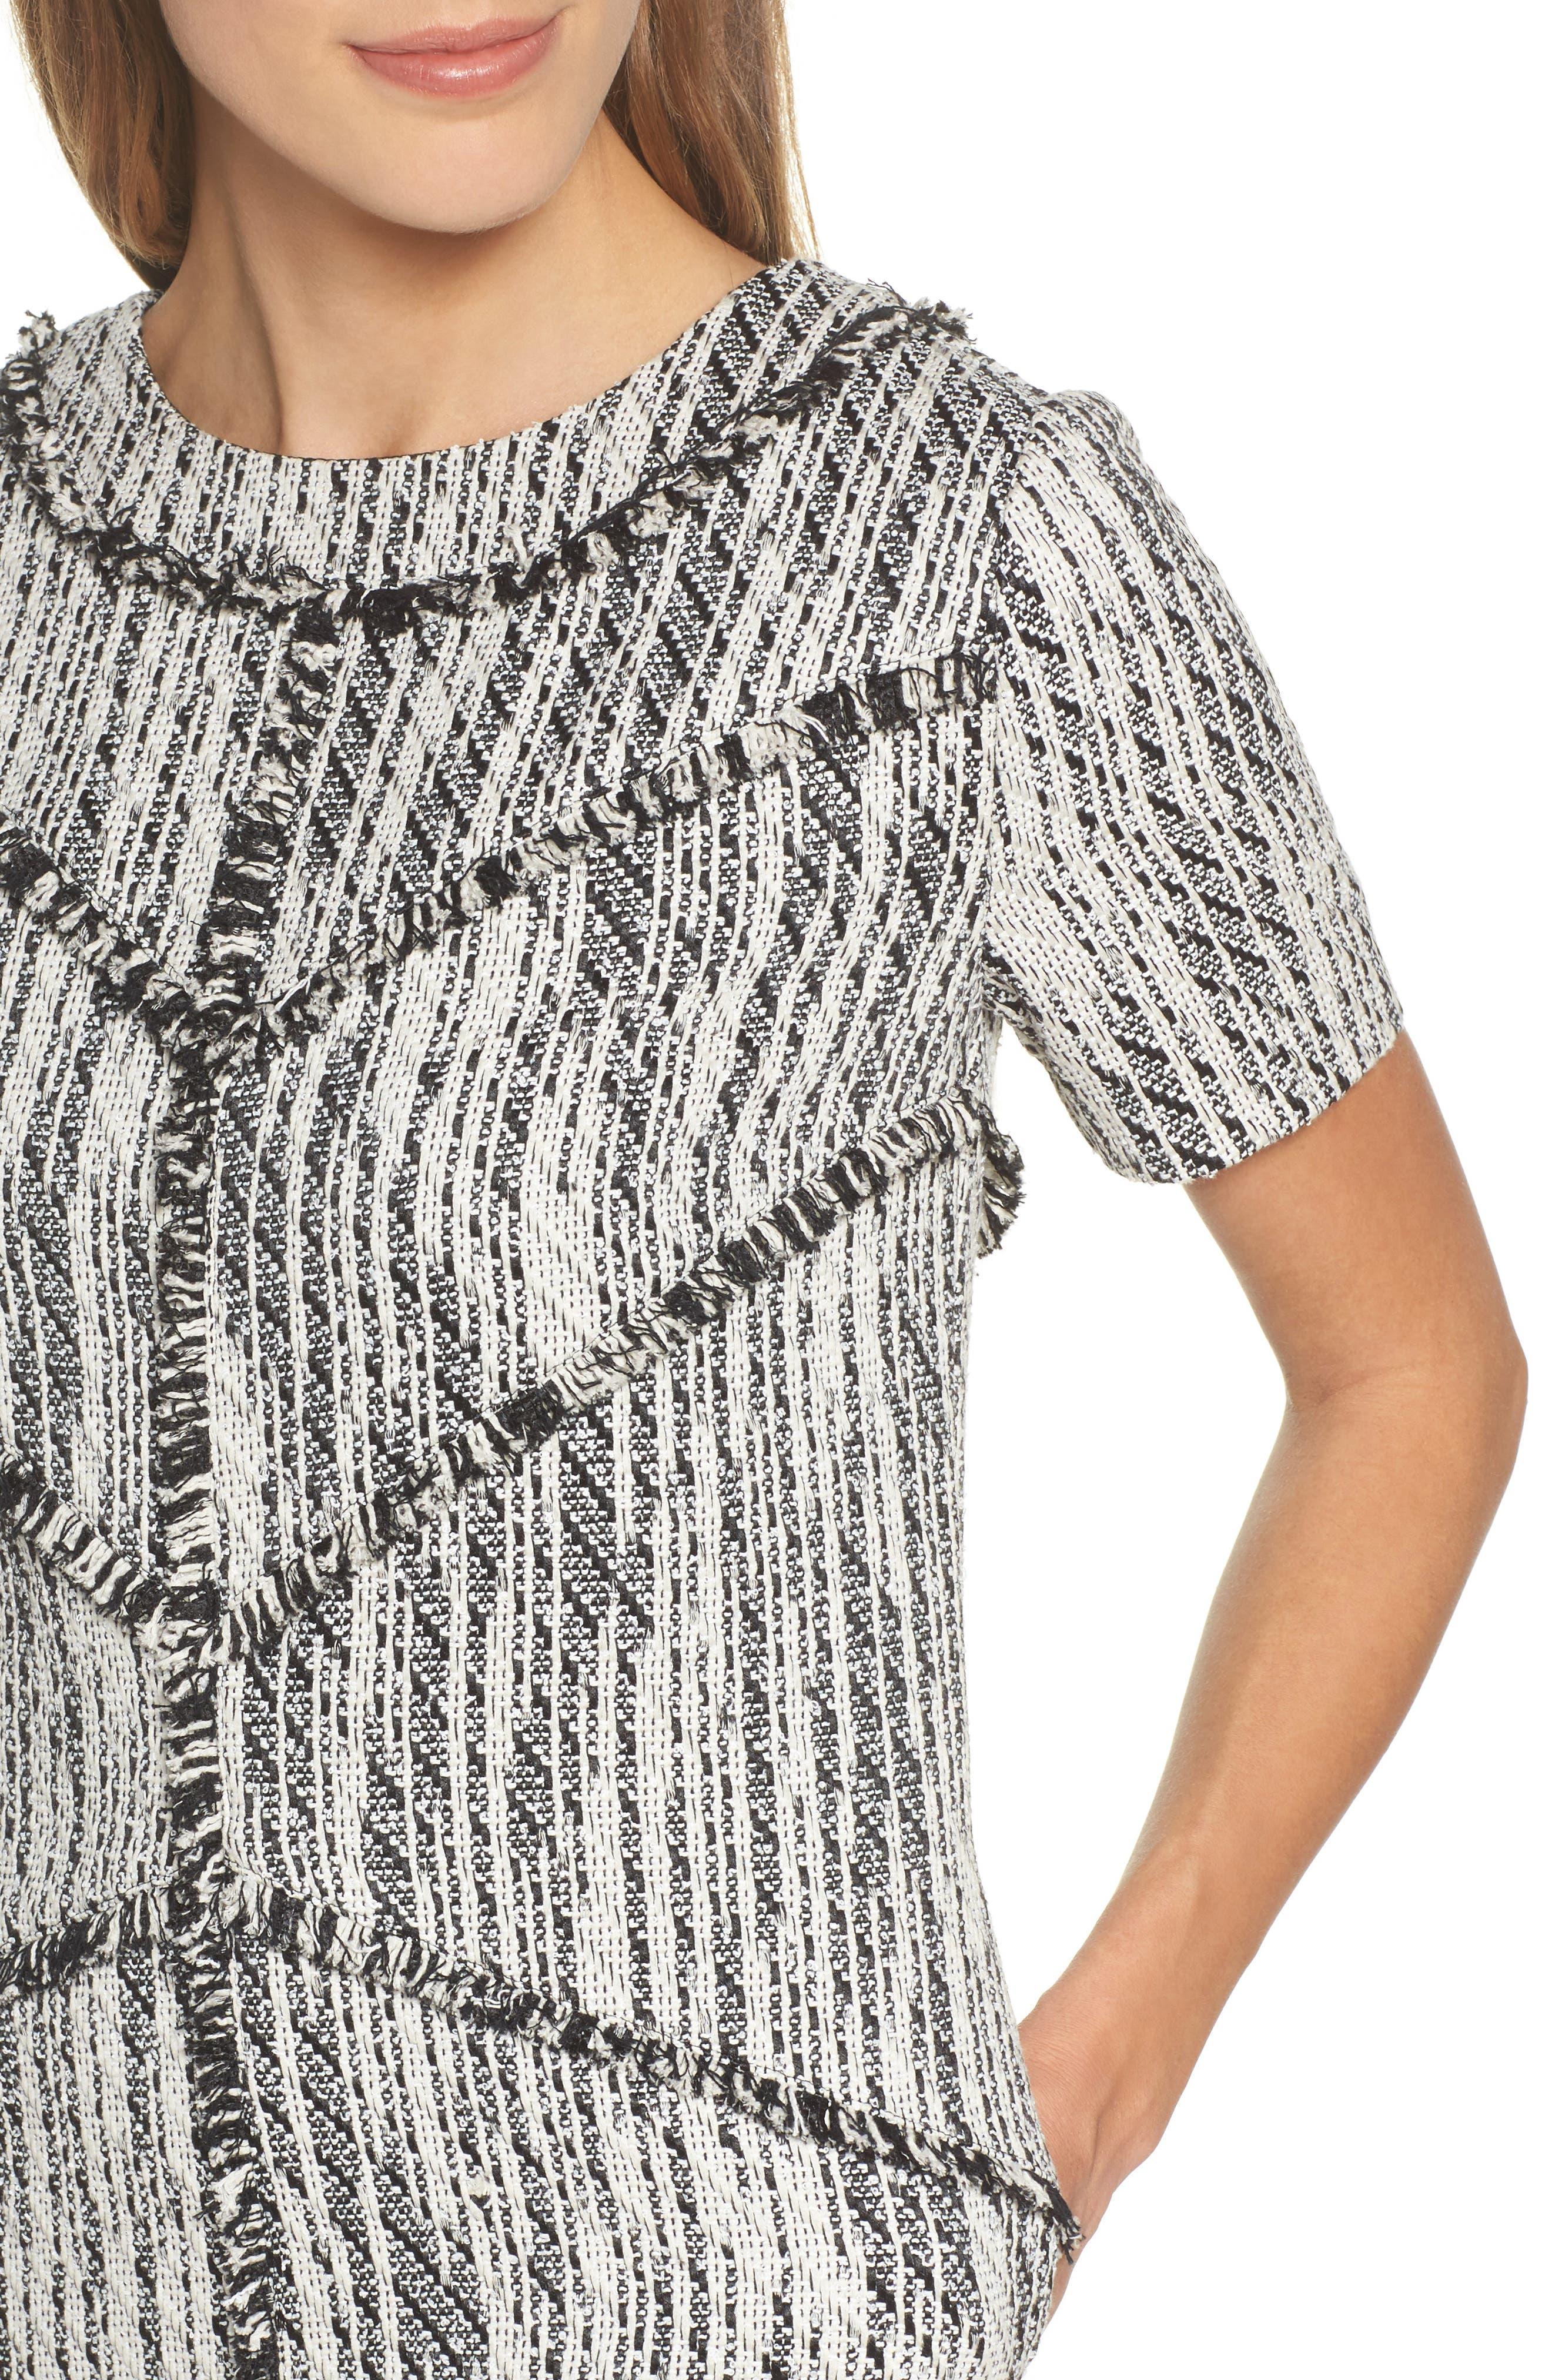 Dolce Vita Tweed Shift Dress,                             Alternate thumbnail 4, color,                             100